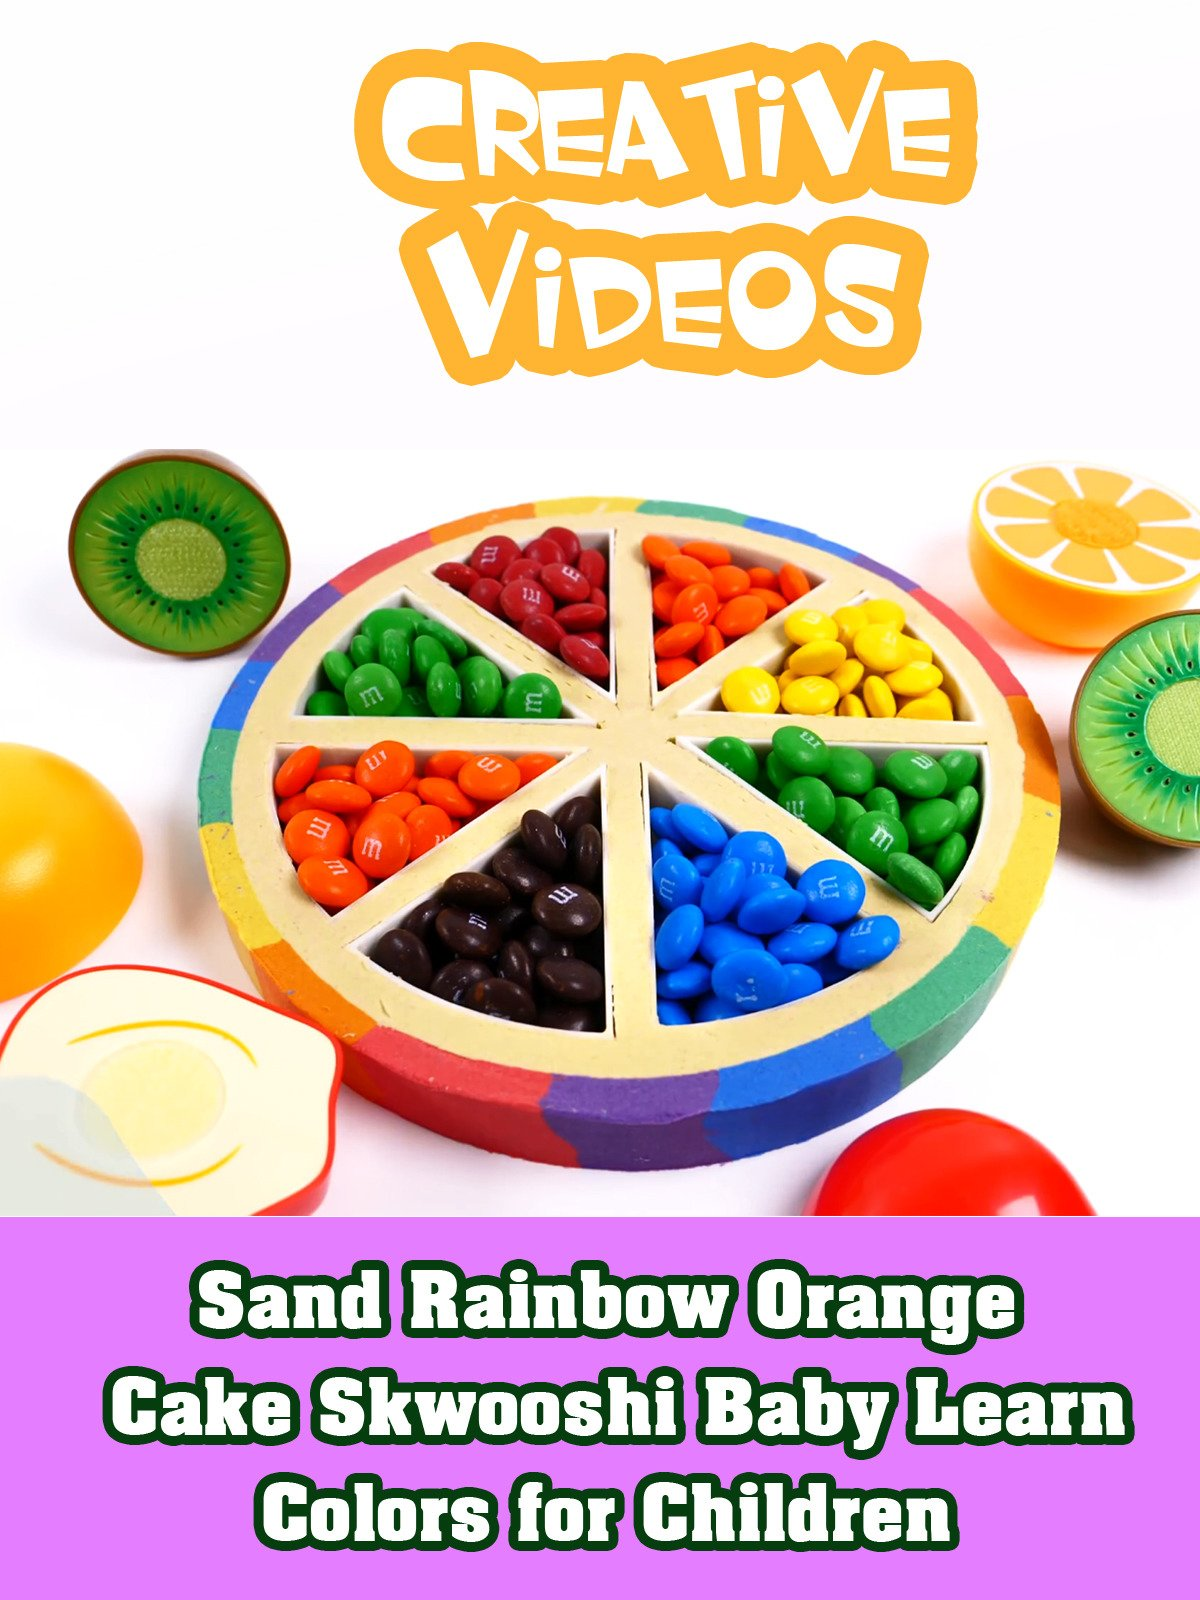 Sand Rainbow Orange Cake Skwooshi Baby Learn Colors for Children